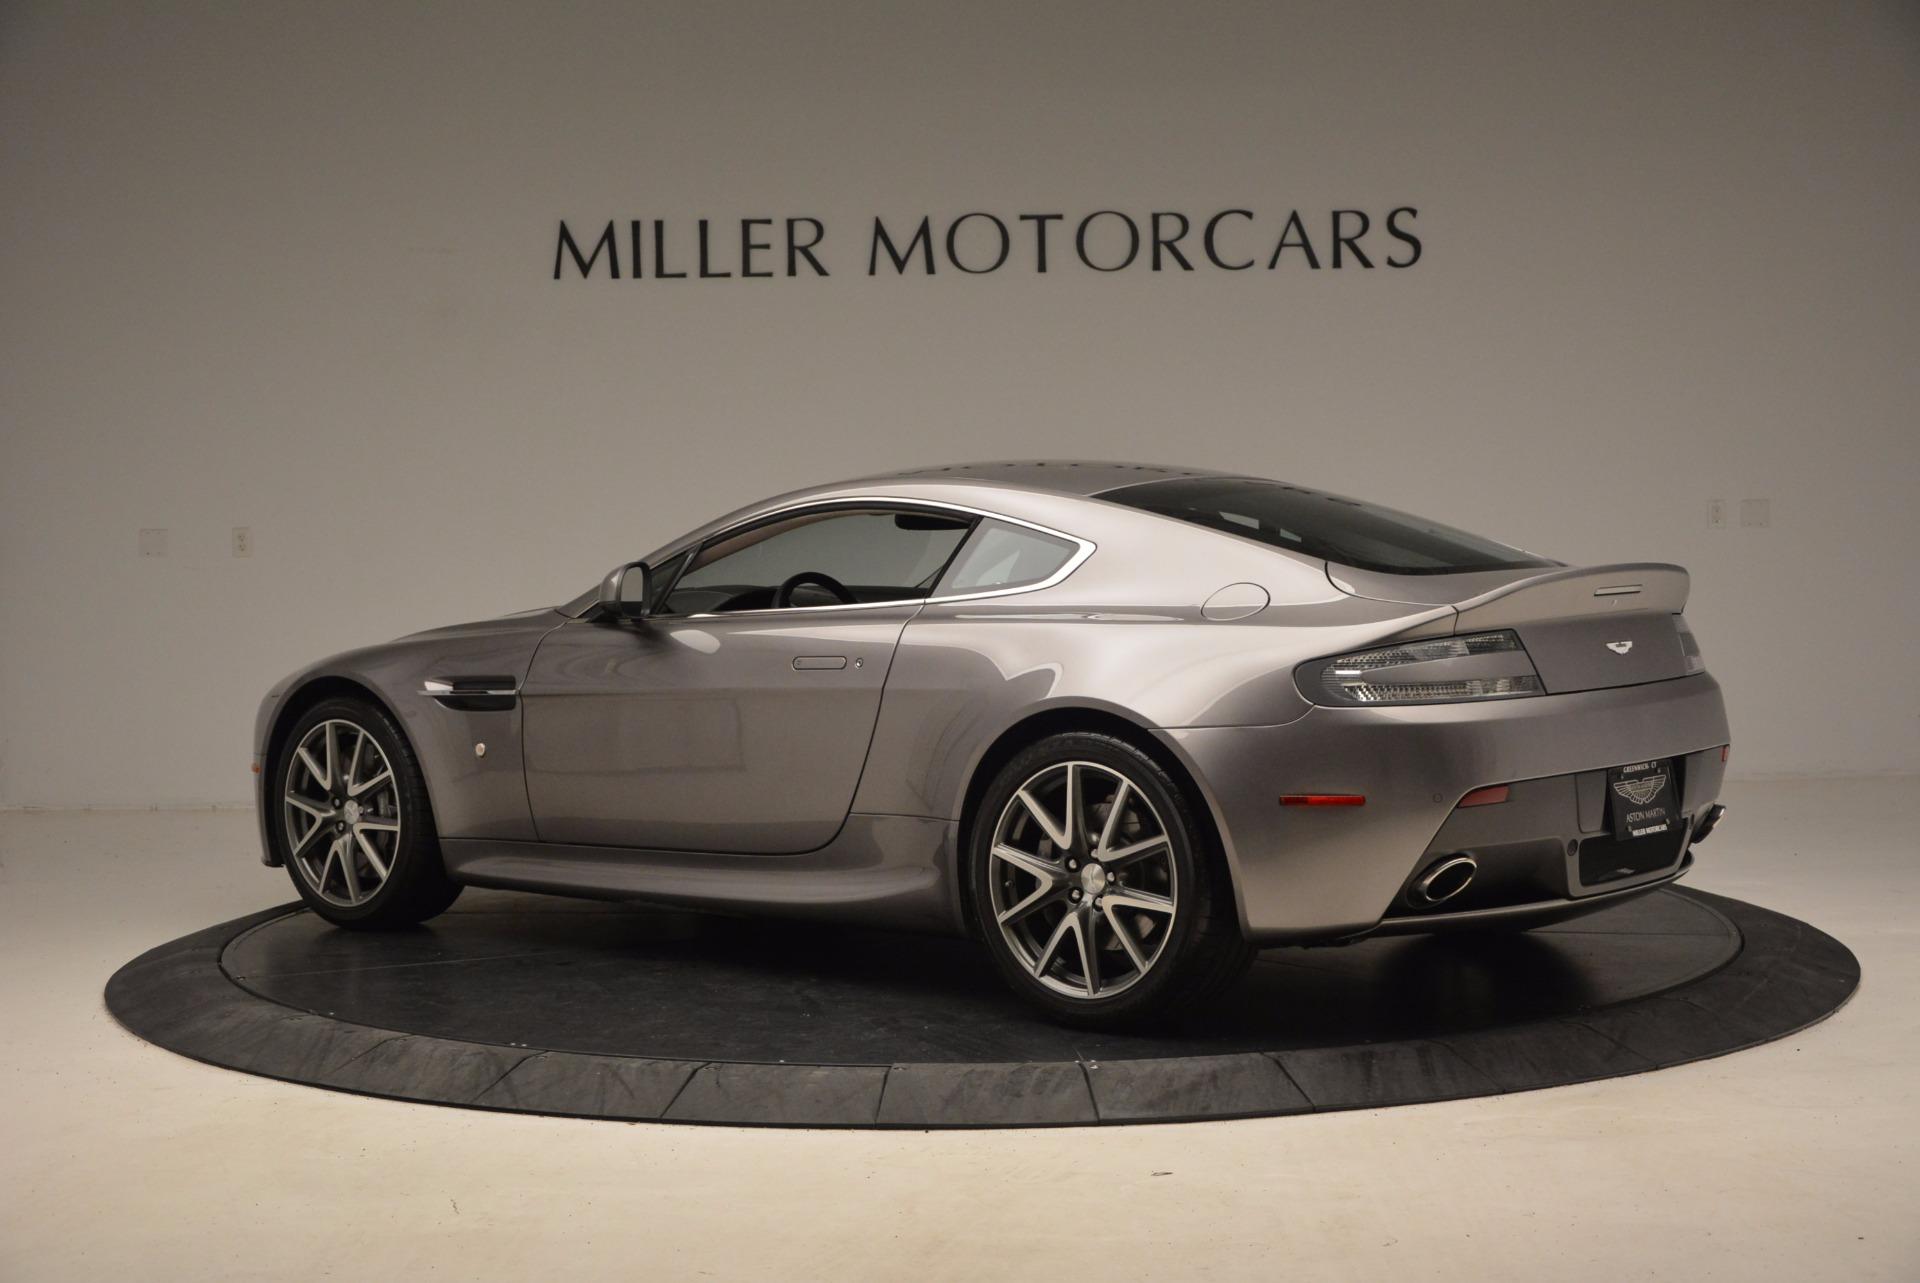 Used 2012 Aston Martin V8 Vantage  For Sale In Greenwich, CT. Alfa Romeo of Greenwich, 7263 1497_p4